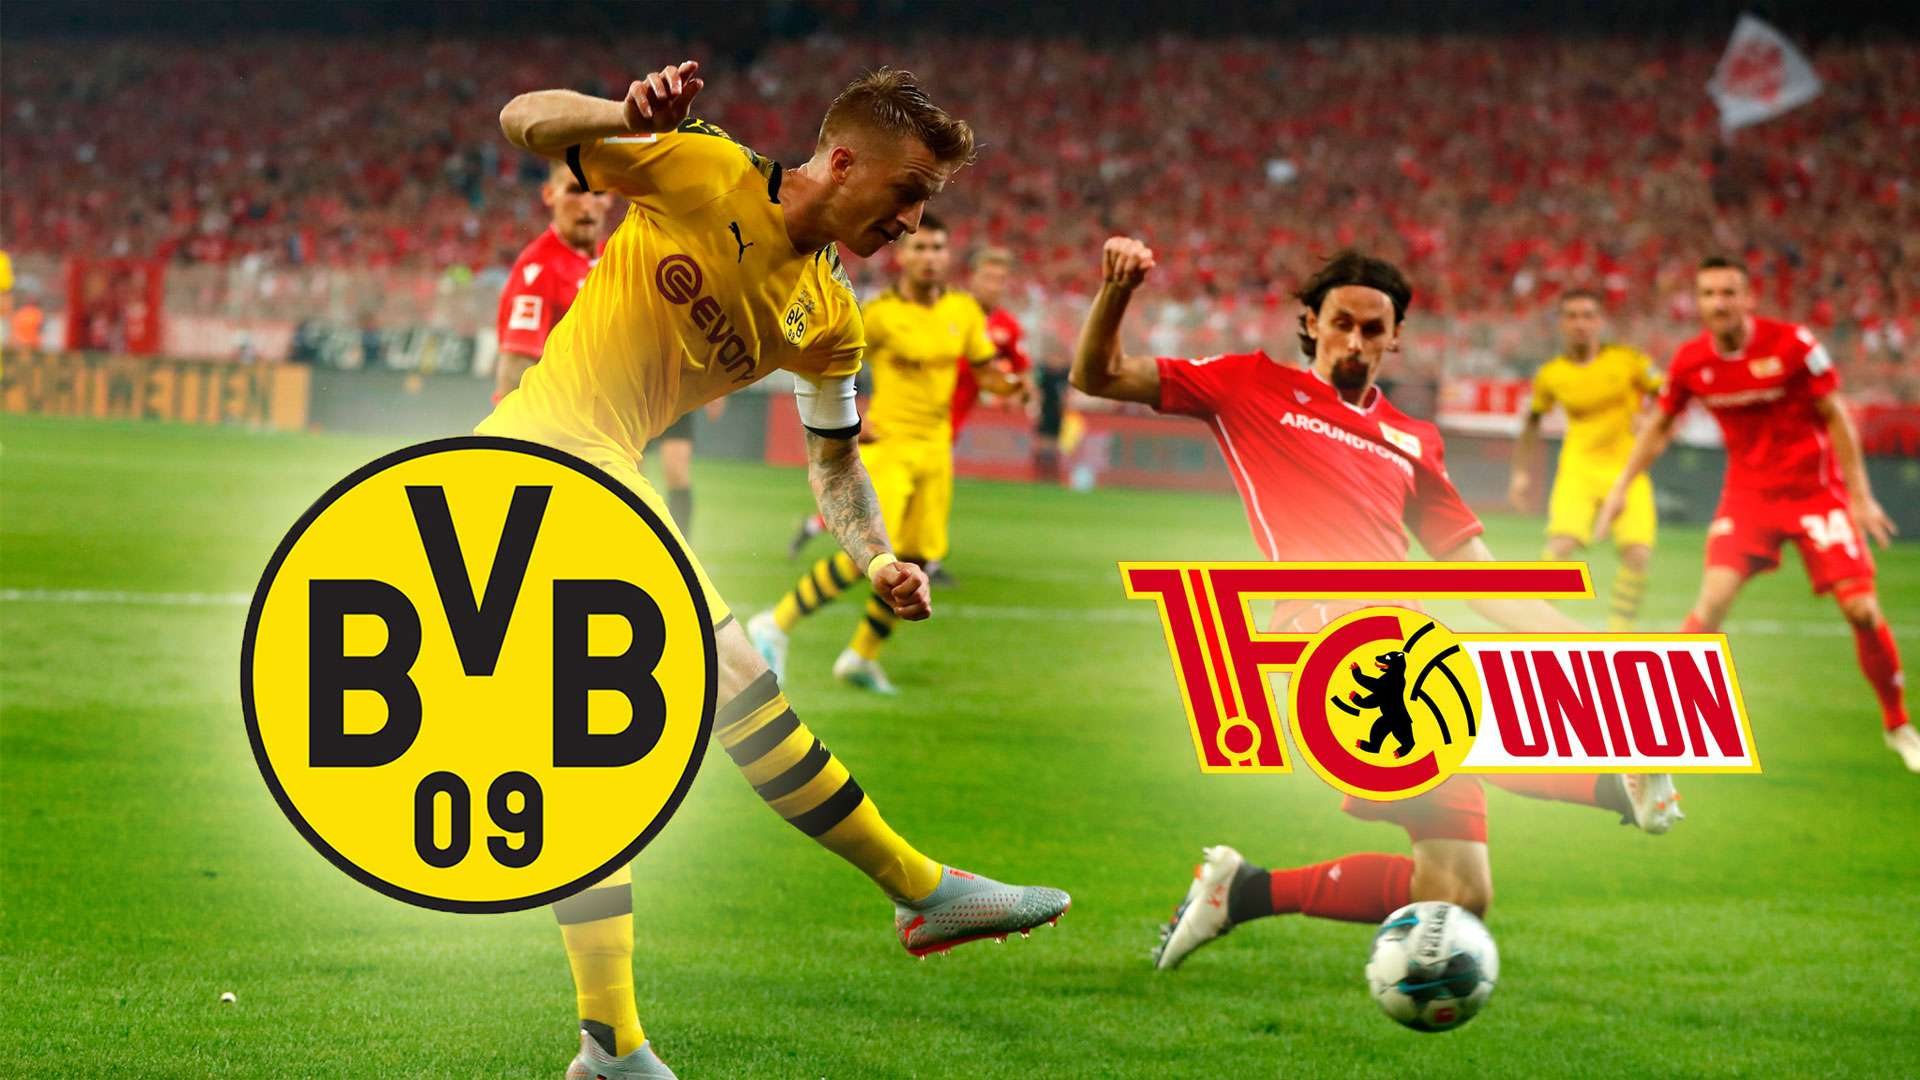 Union Berlin Dortmund Live Stream